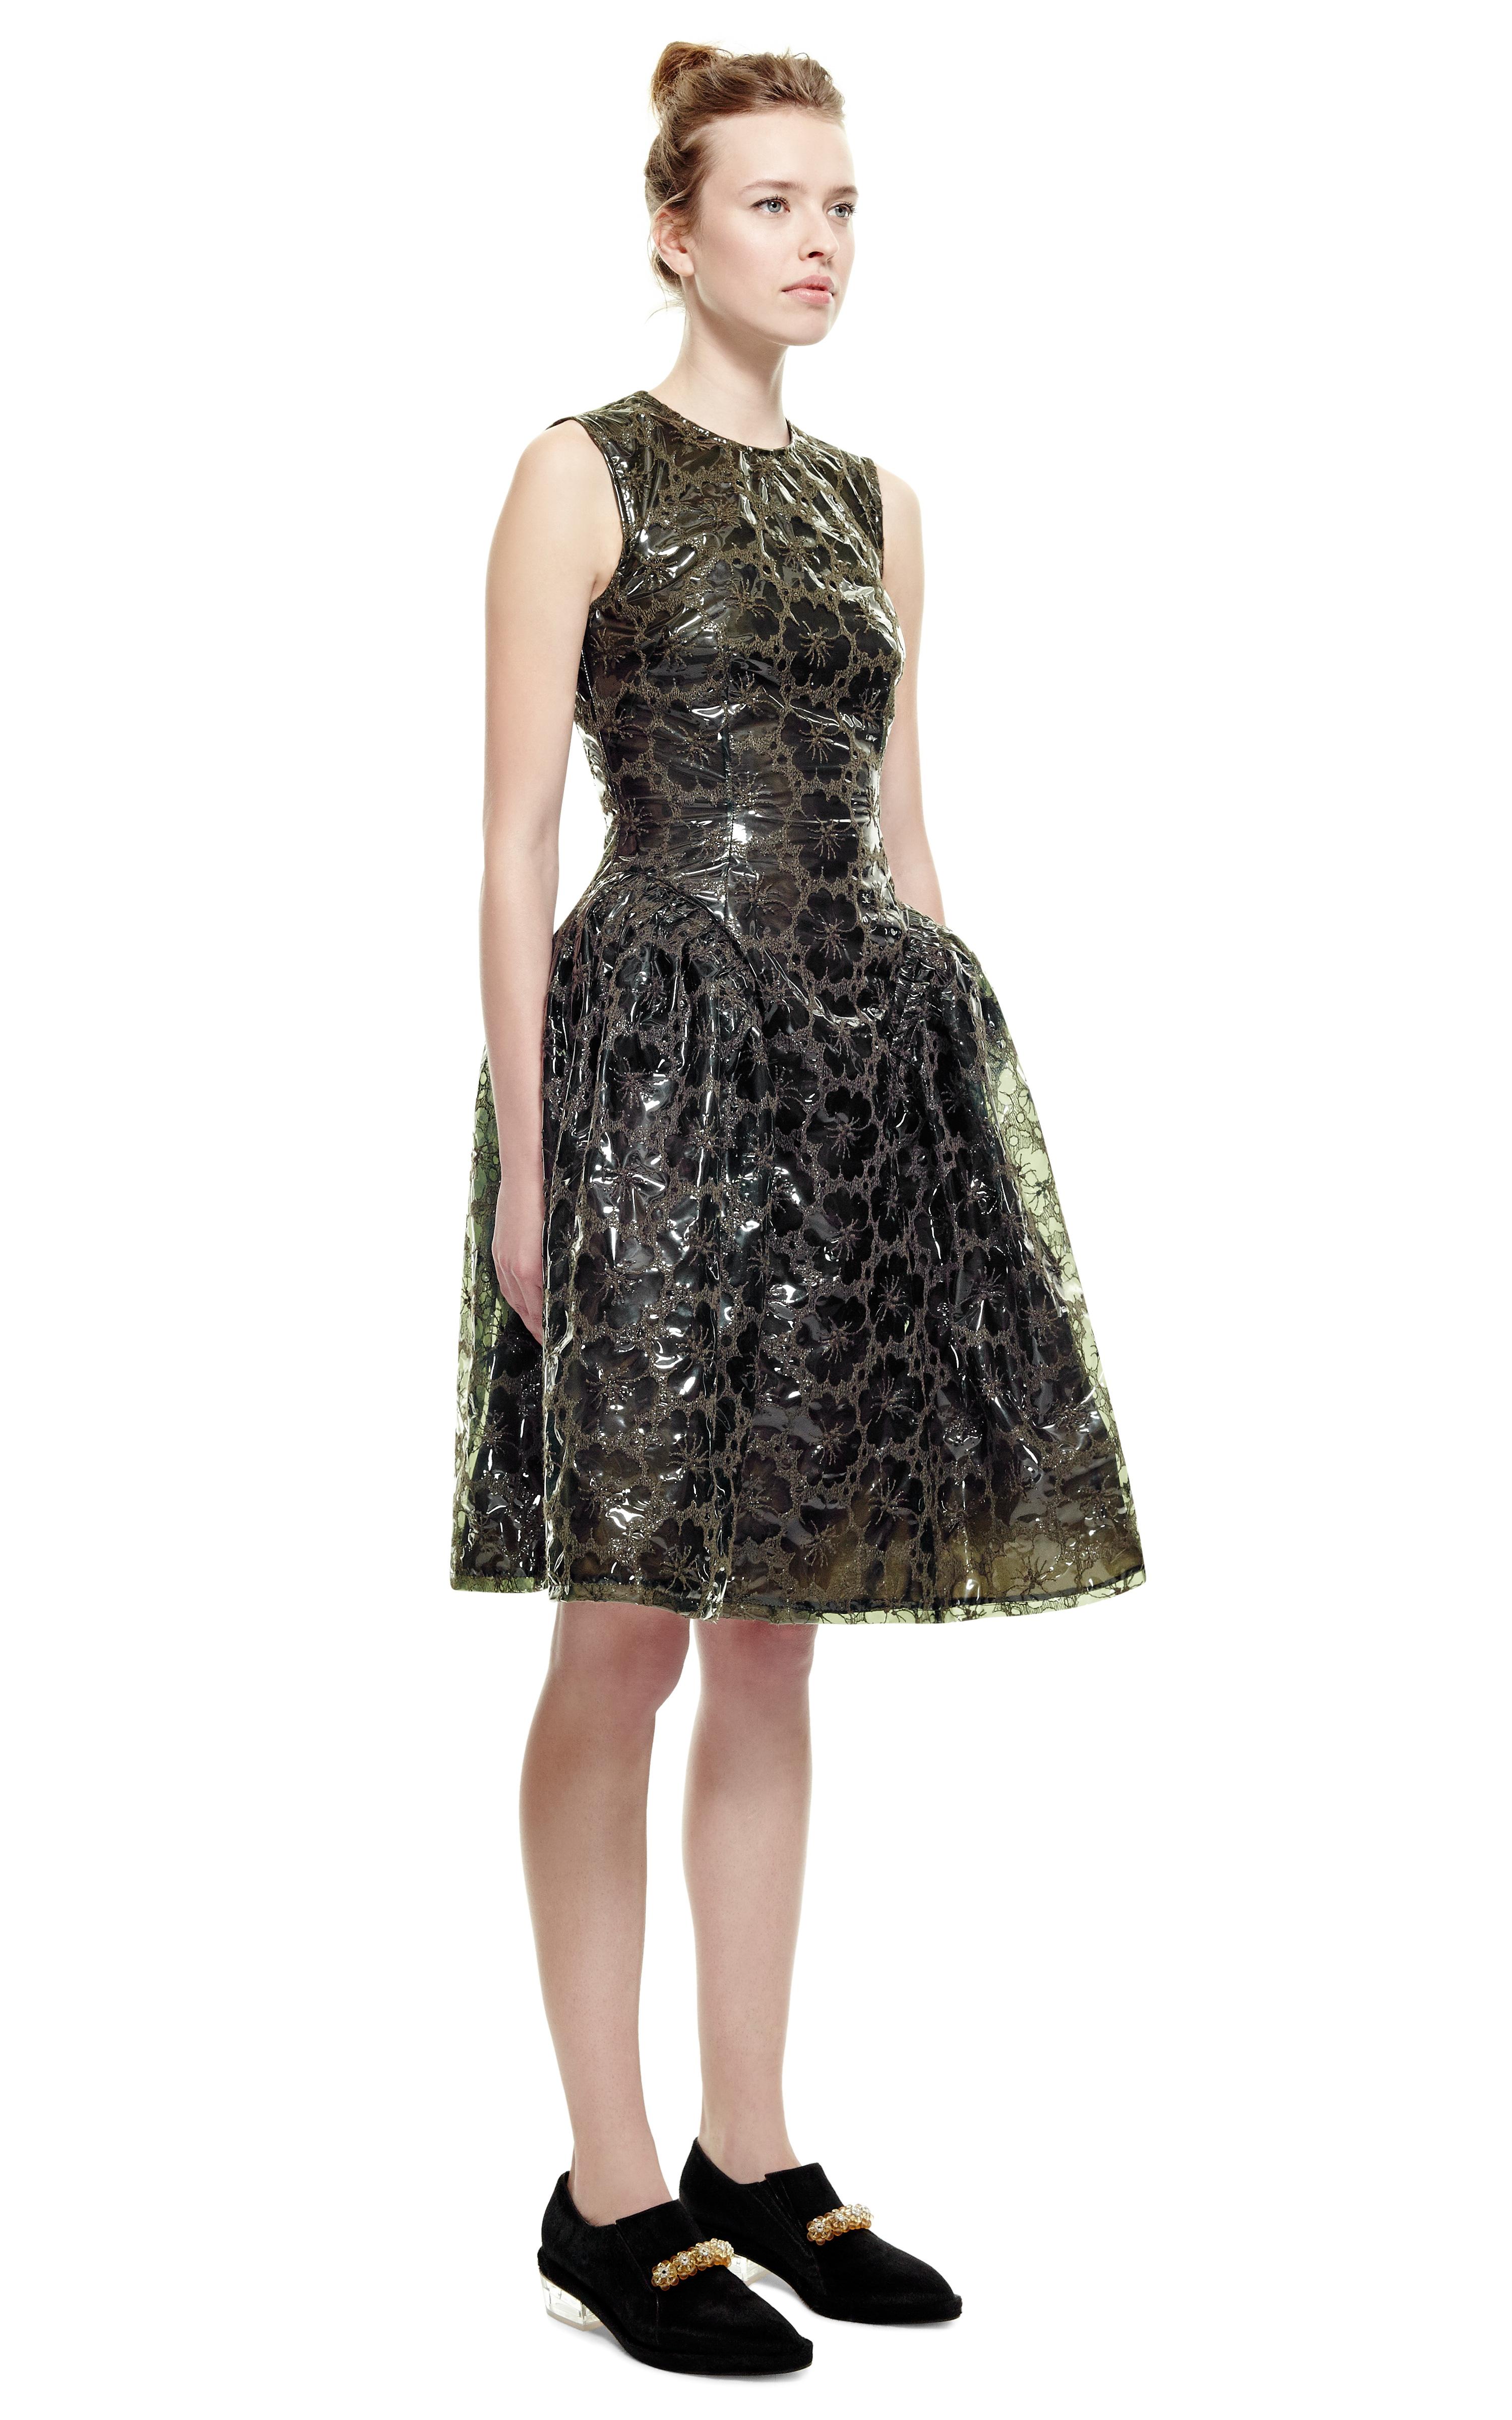 Lyst Simone Rocha Khaki Embroidered Plastic Dress In Natural